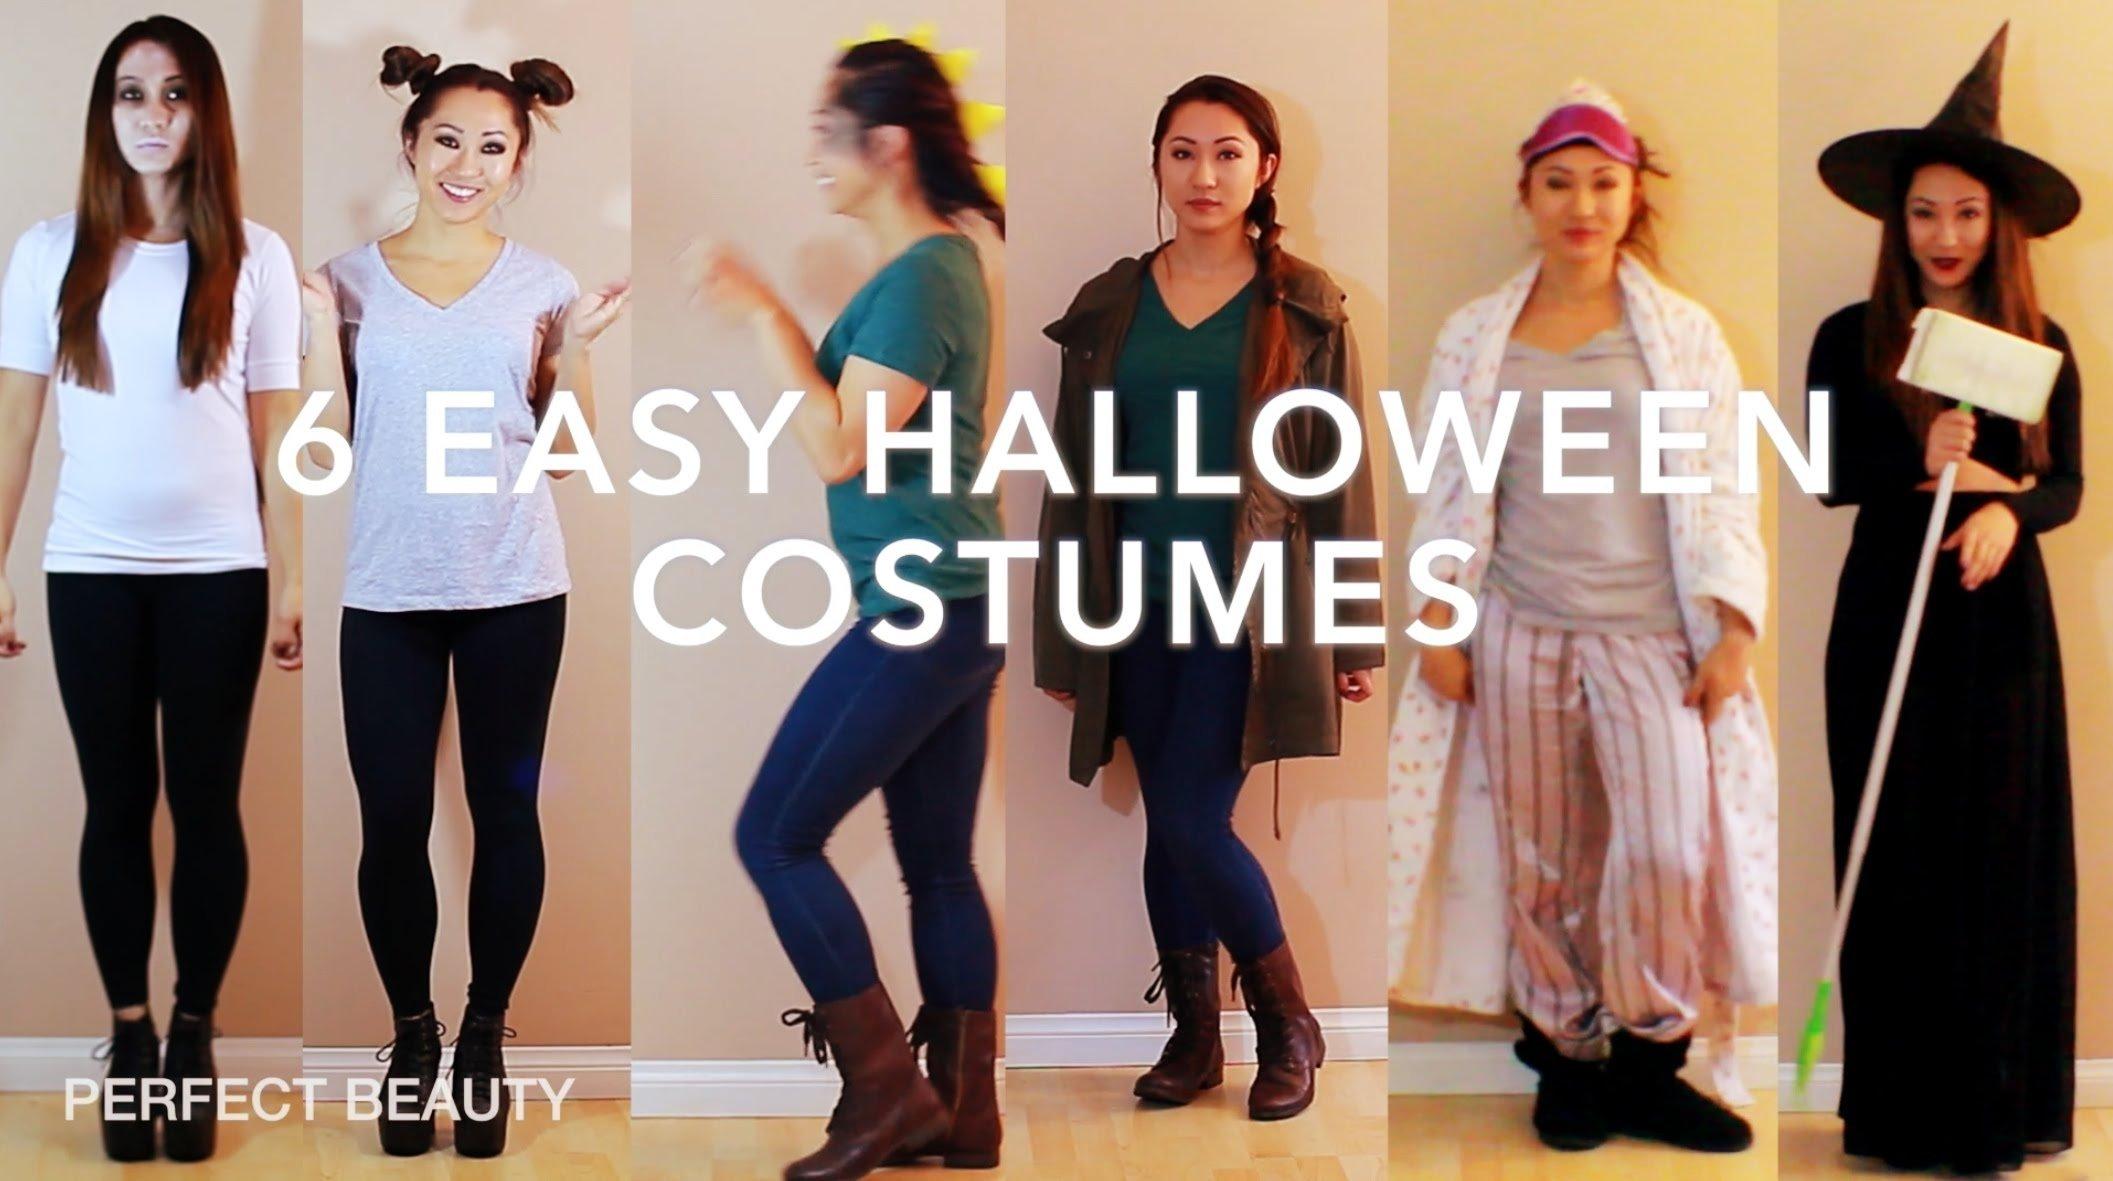 10 Wonderful Homemade Halloween Costumes Ideas For Adults last minute diy halloween costume ideas perfect beauty youtube 24 2021